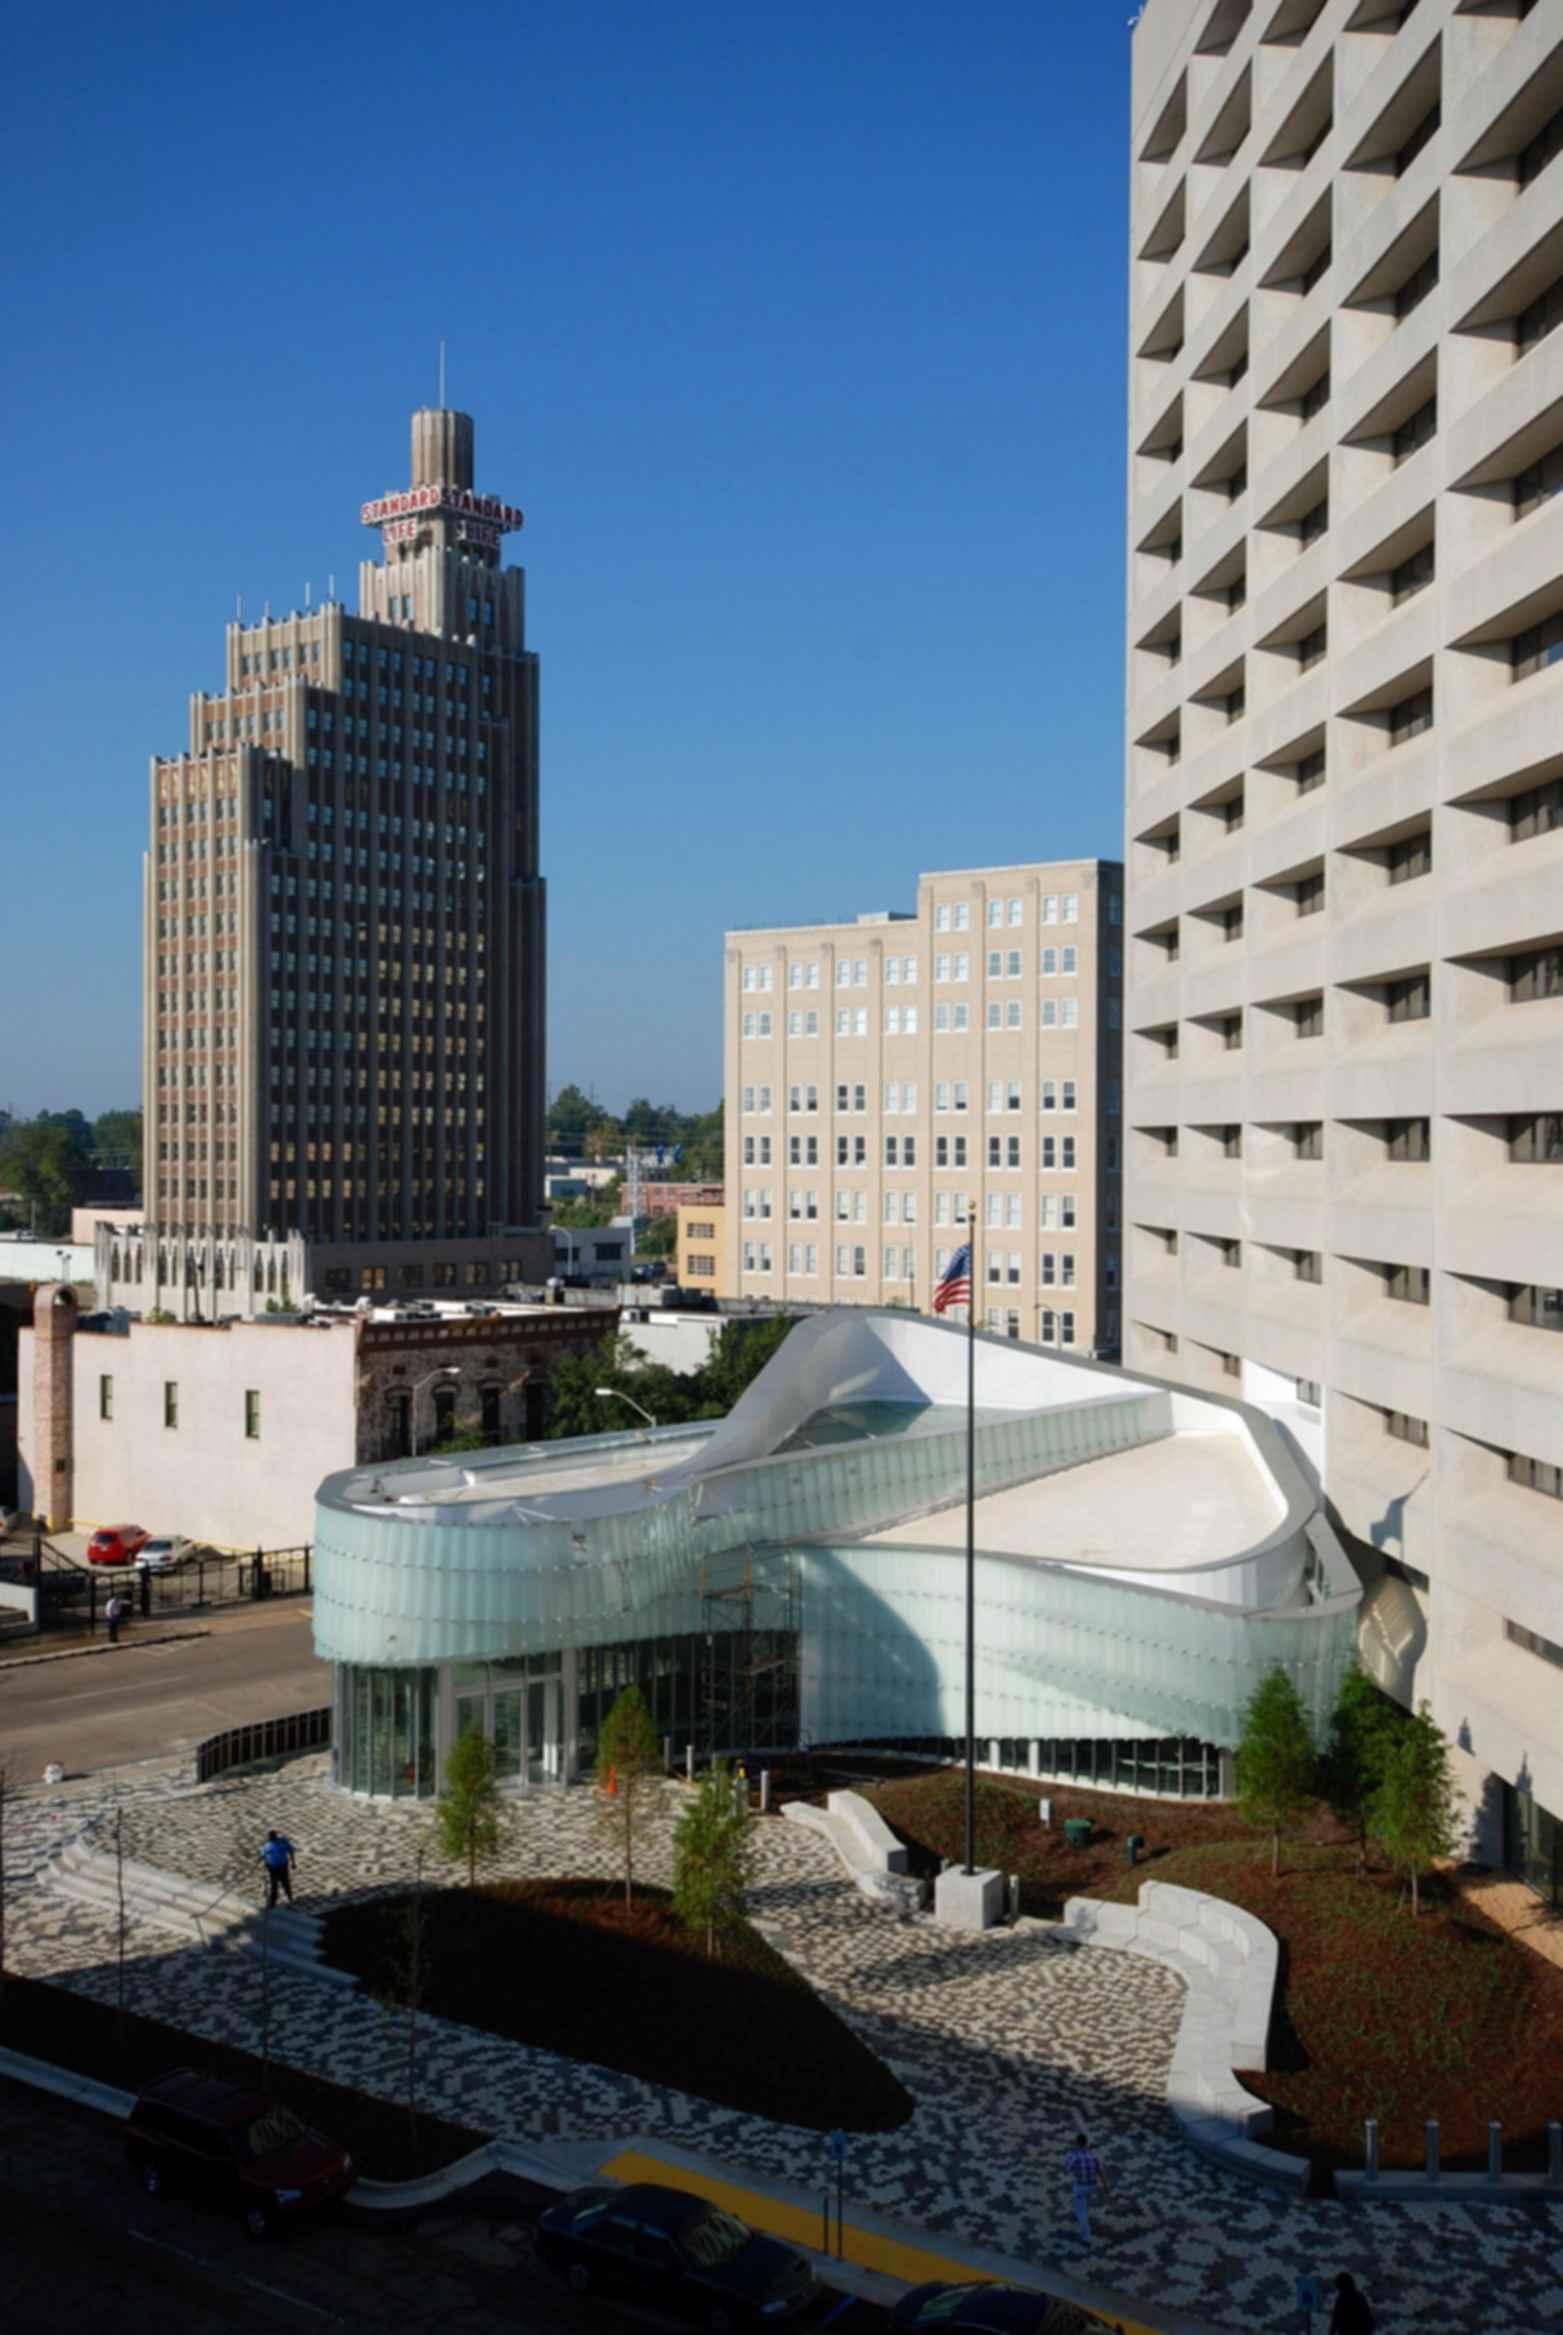 Dr. A.H. McCoy Federal Building - Exterior/Landscape